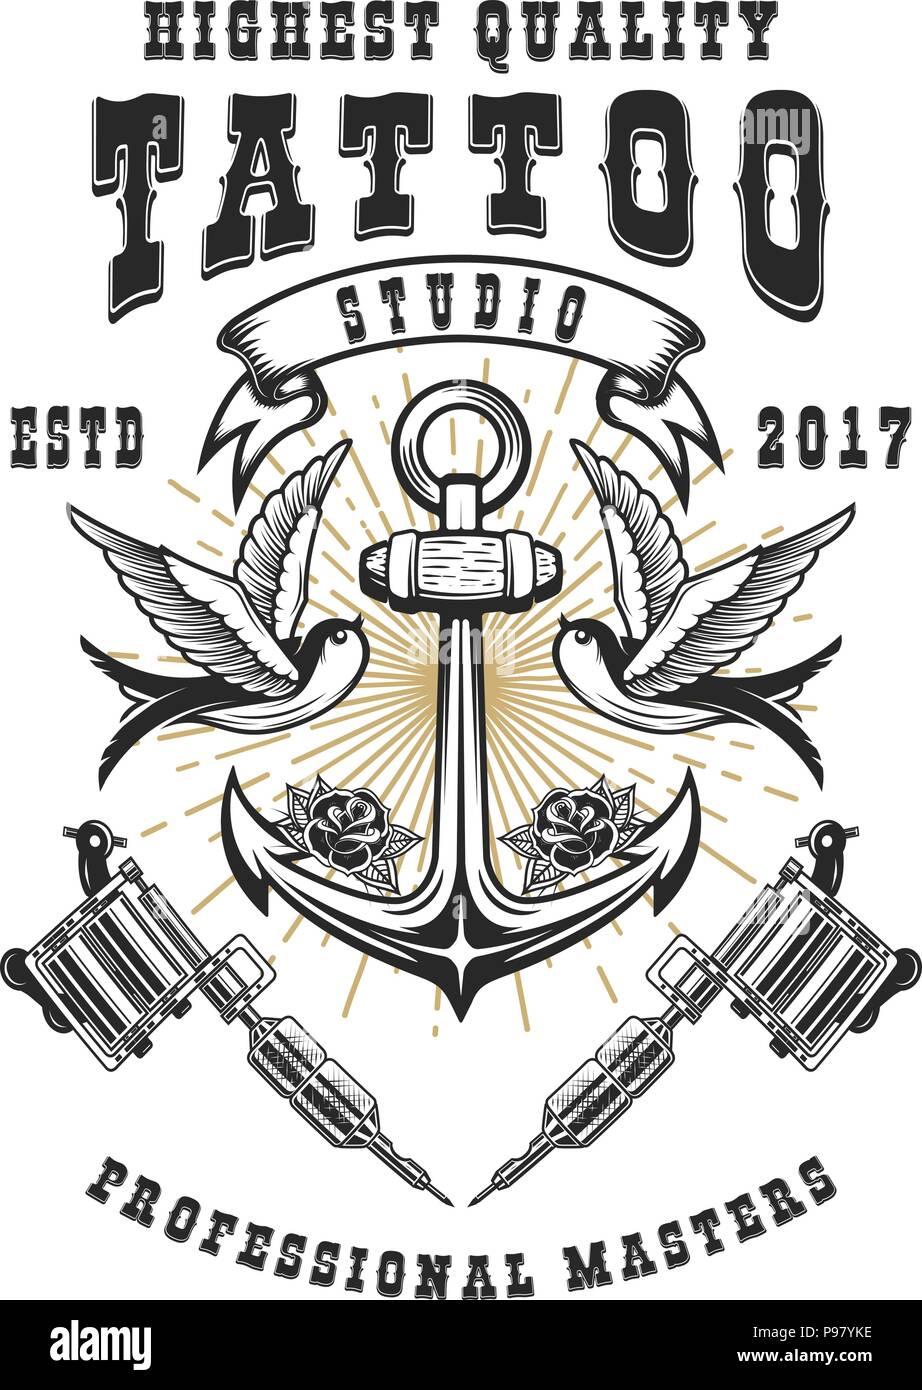 Tattoo Studio Poster Plantilla Cruzó Máquinas De Tatuaje Ancla Con